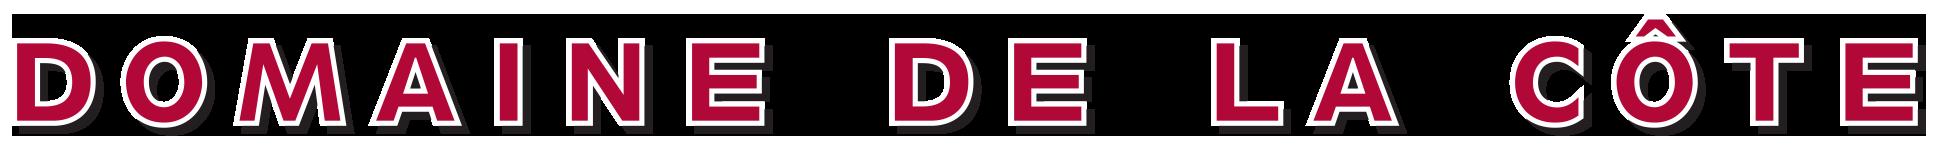 DDLC_logo.png